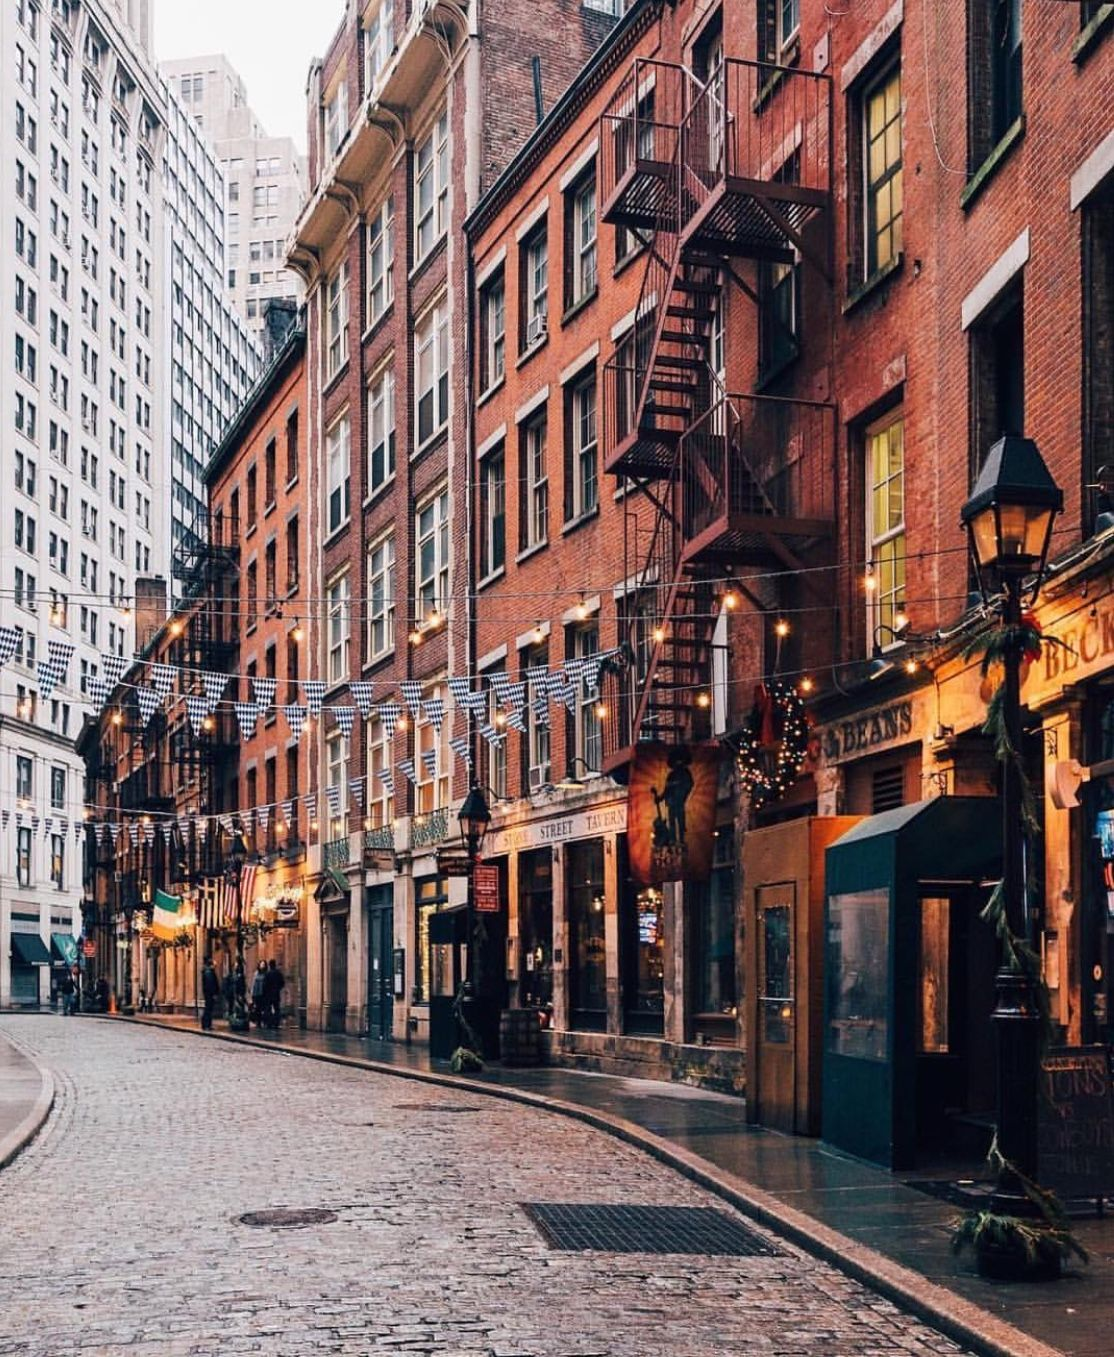 New York New York Uo New York City Landscape Photography Cityscape